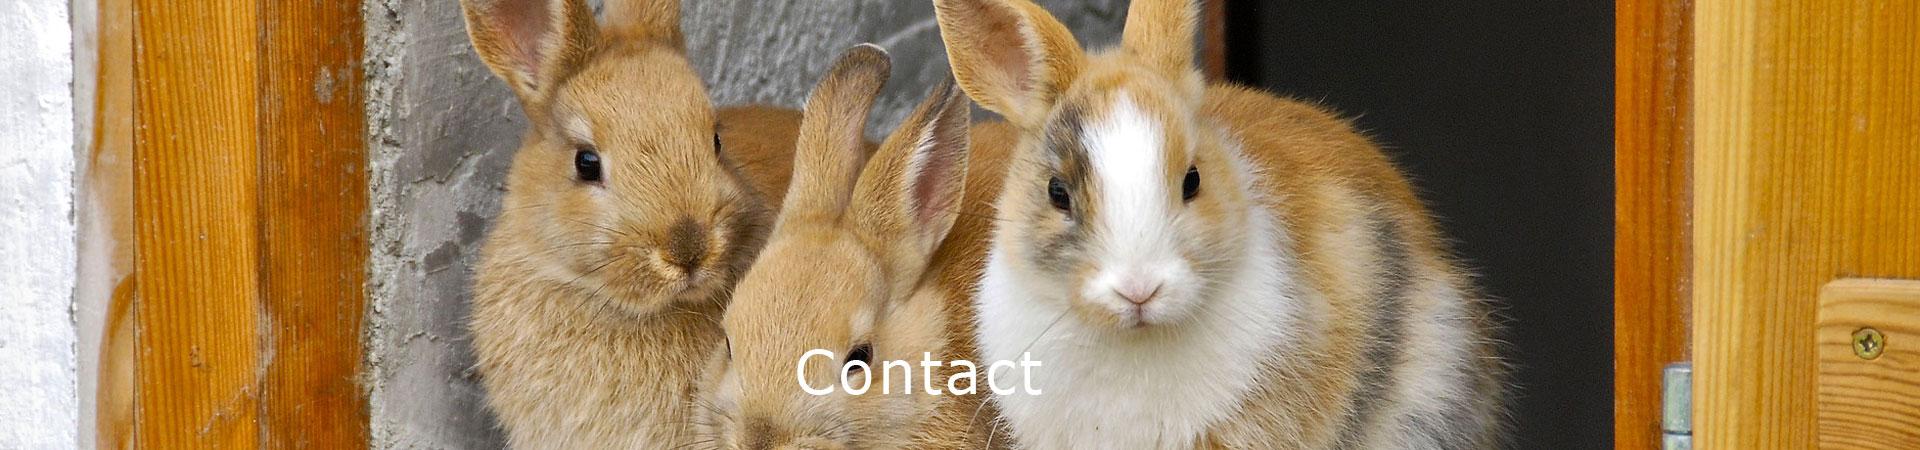 contact dierenkliniek erasmusplein den haag